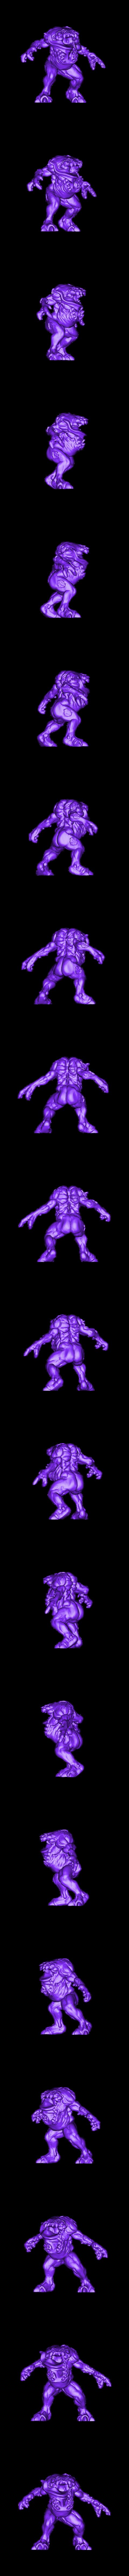 Demon2.stl Download free STL file 3x Demons • 3D printing object, duncanshadow